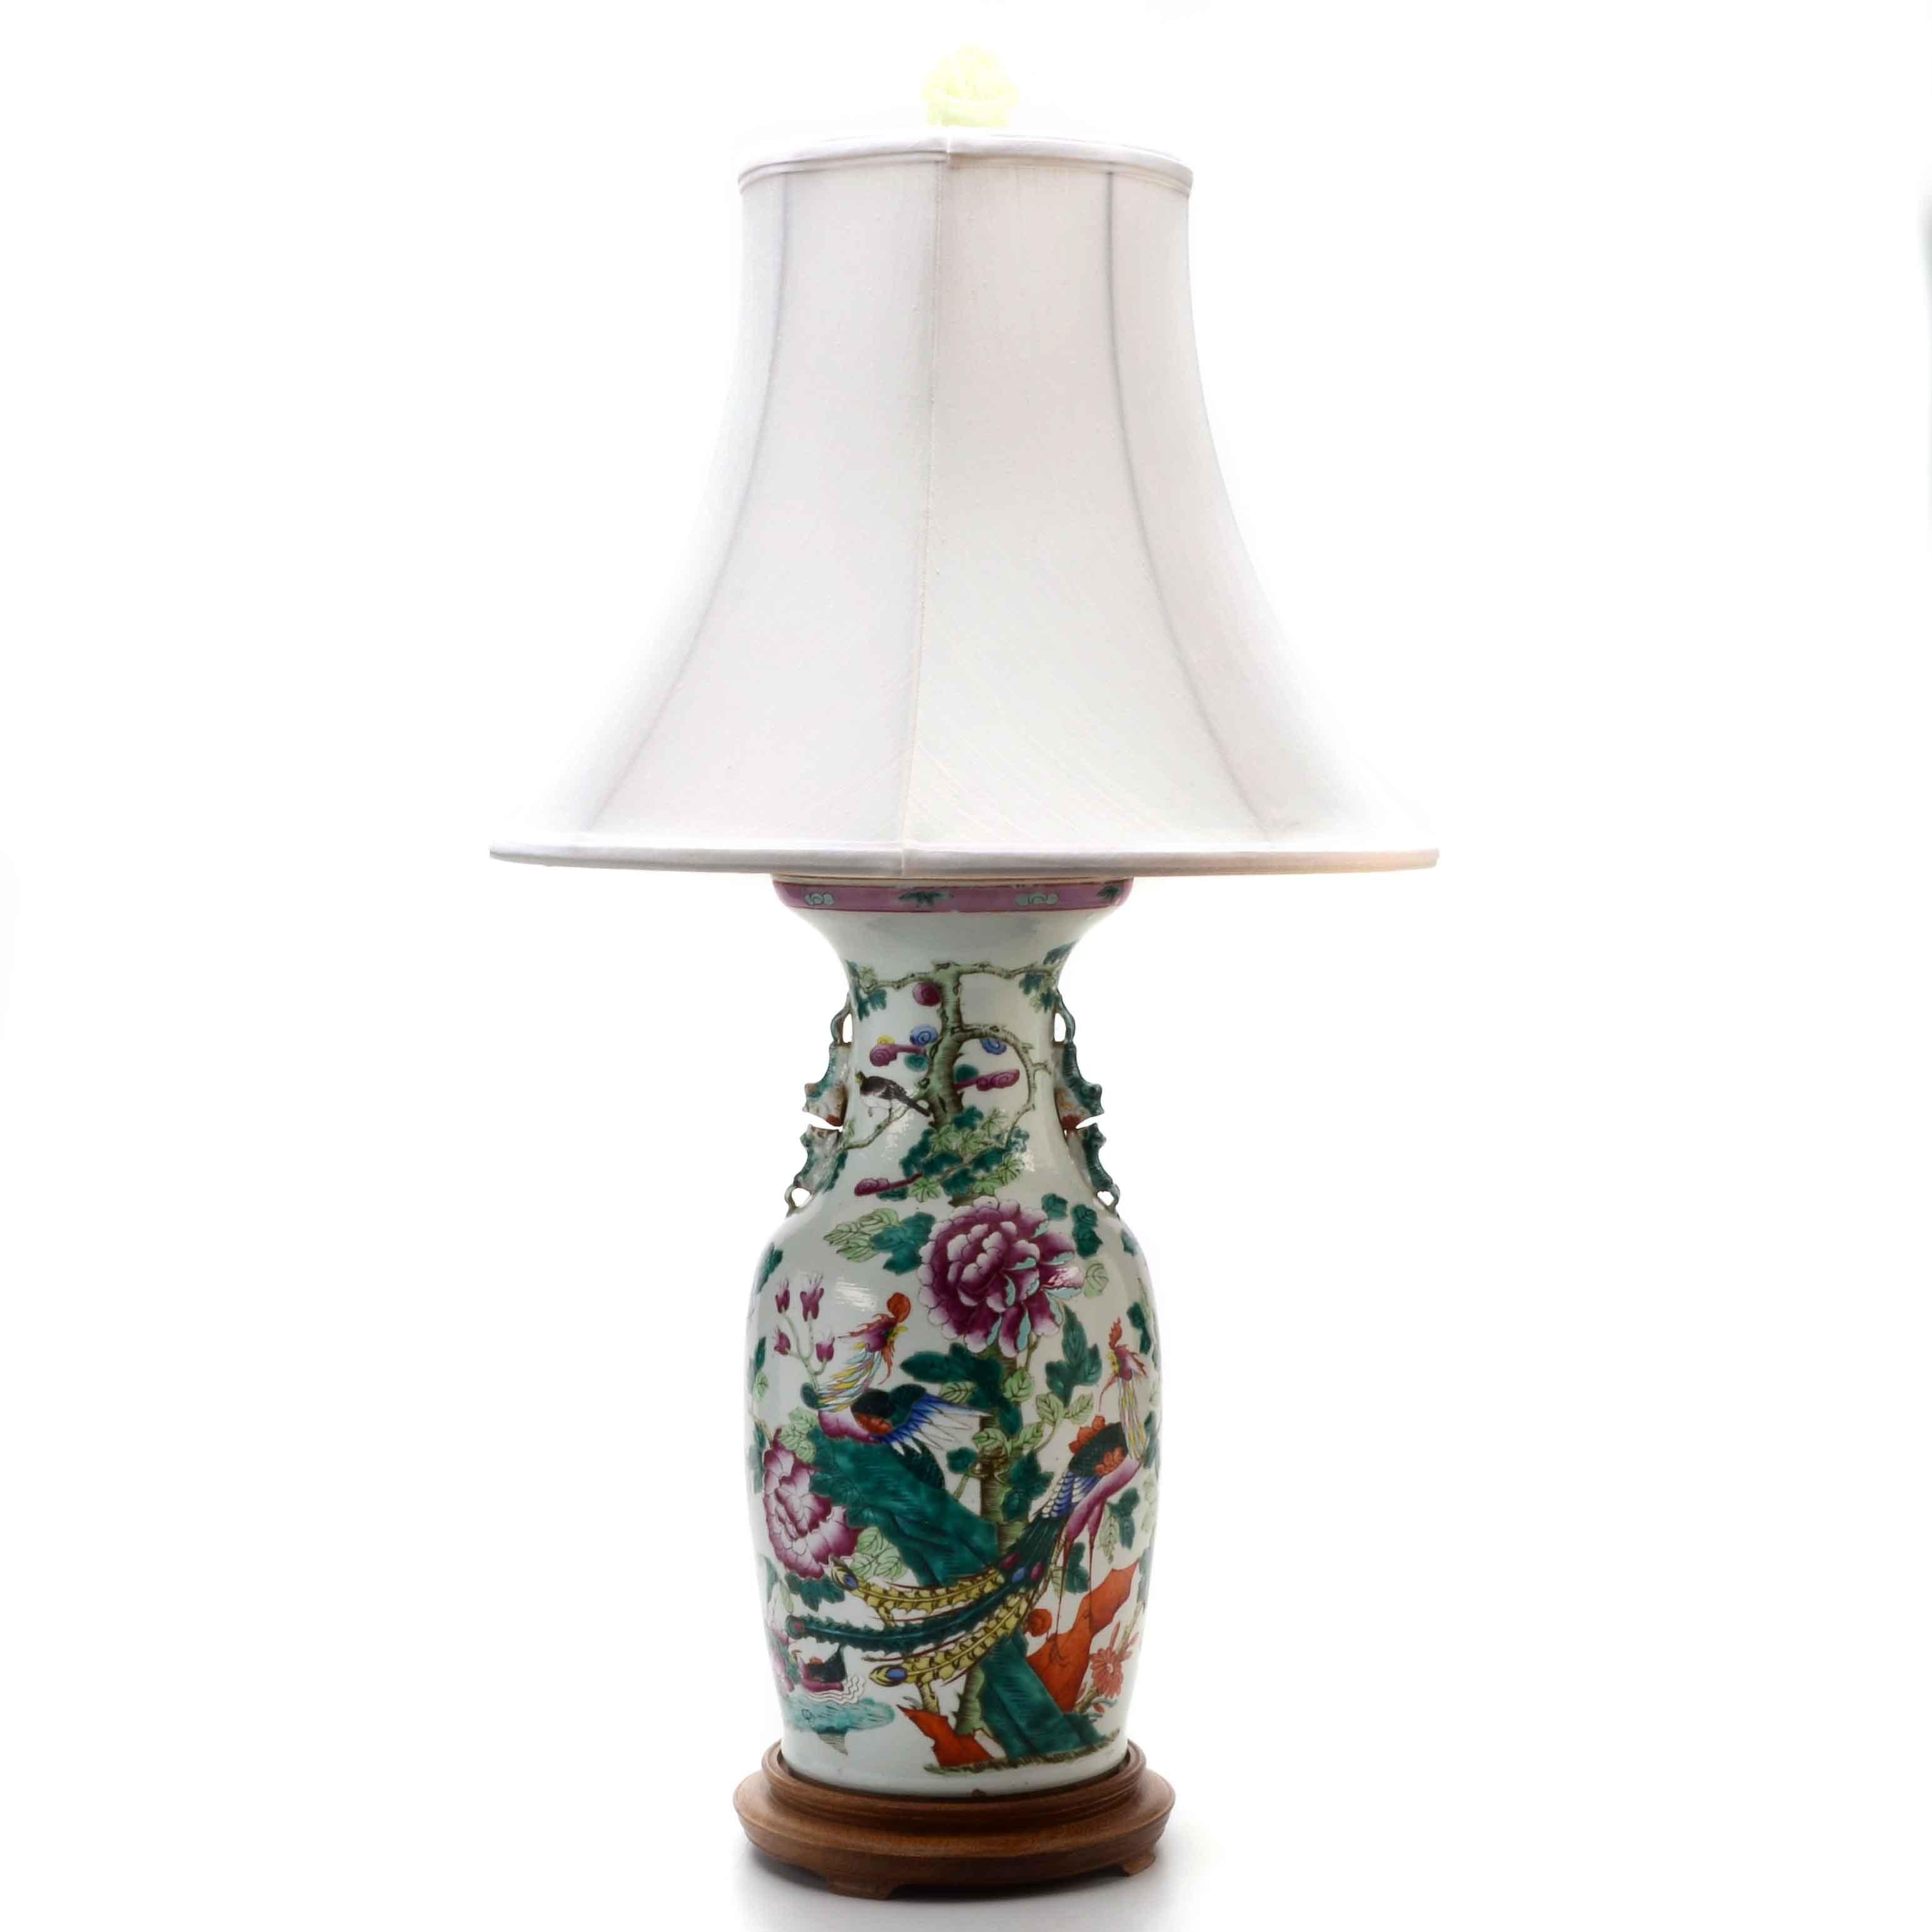 Chinese Porcelain Vase Lamp